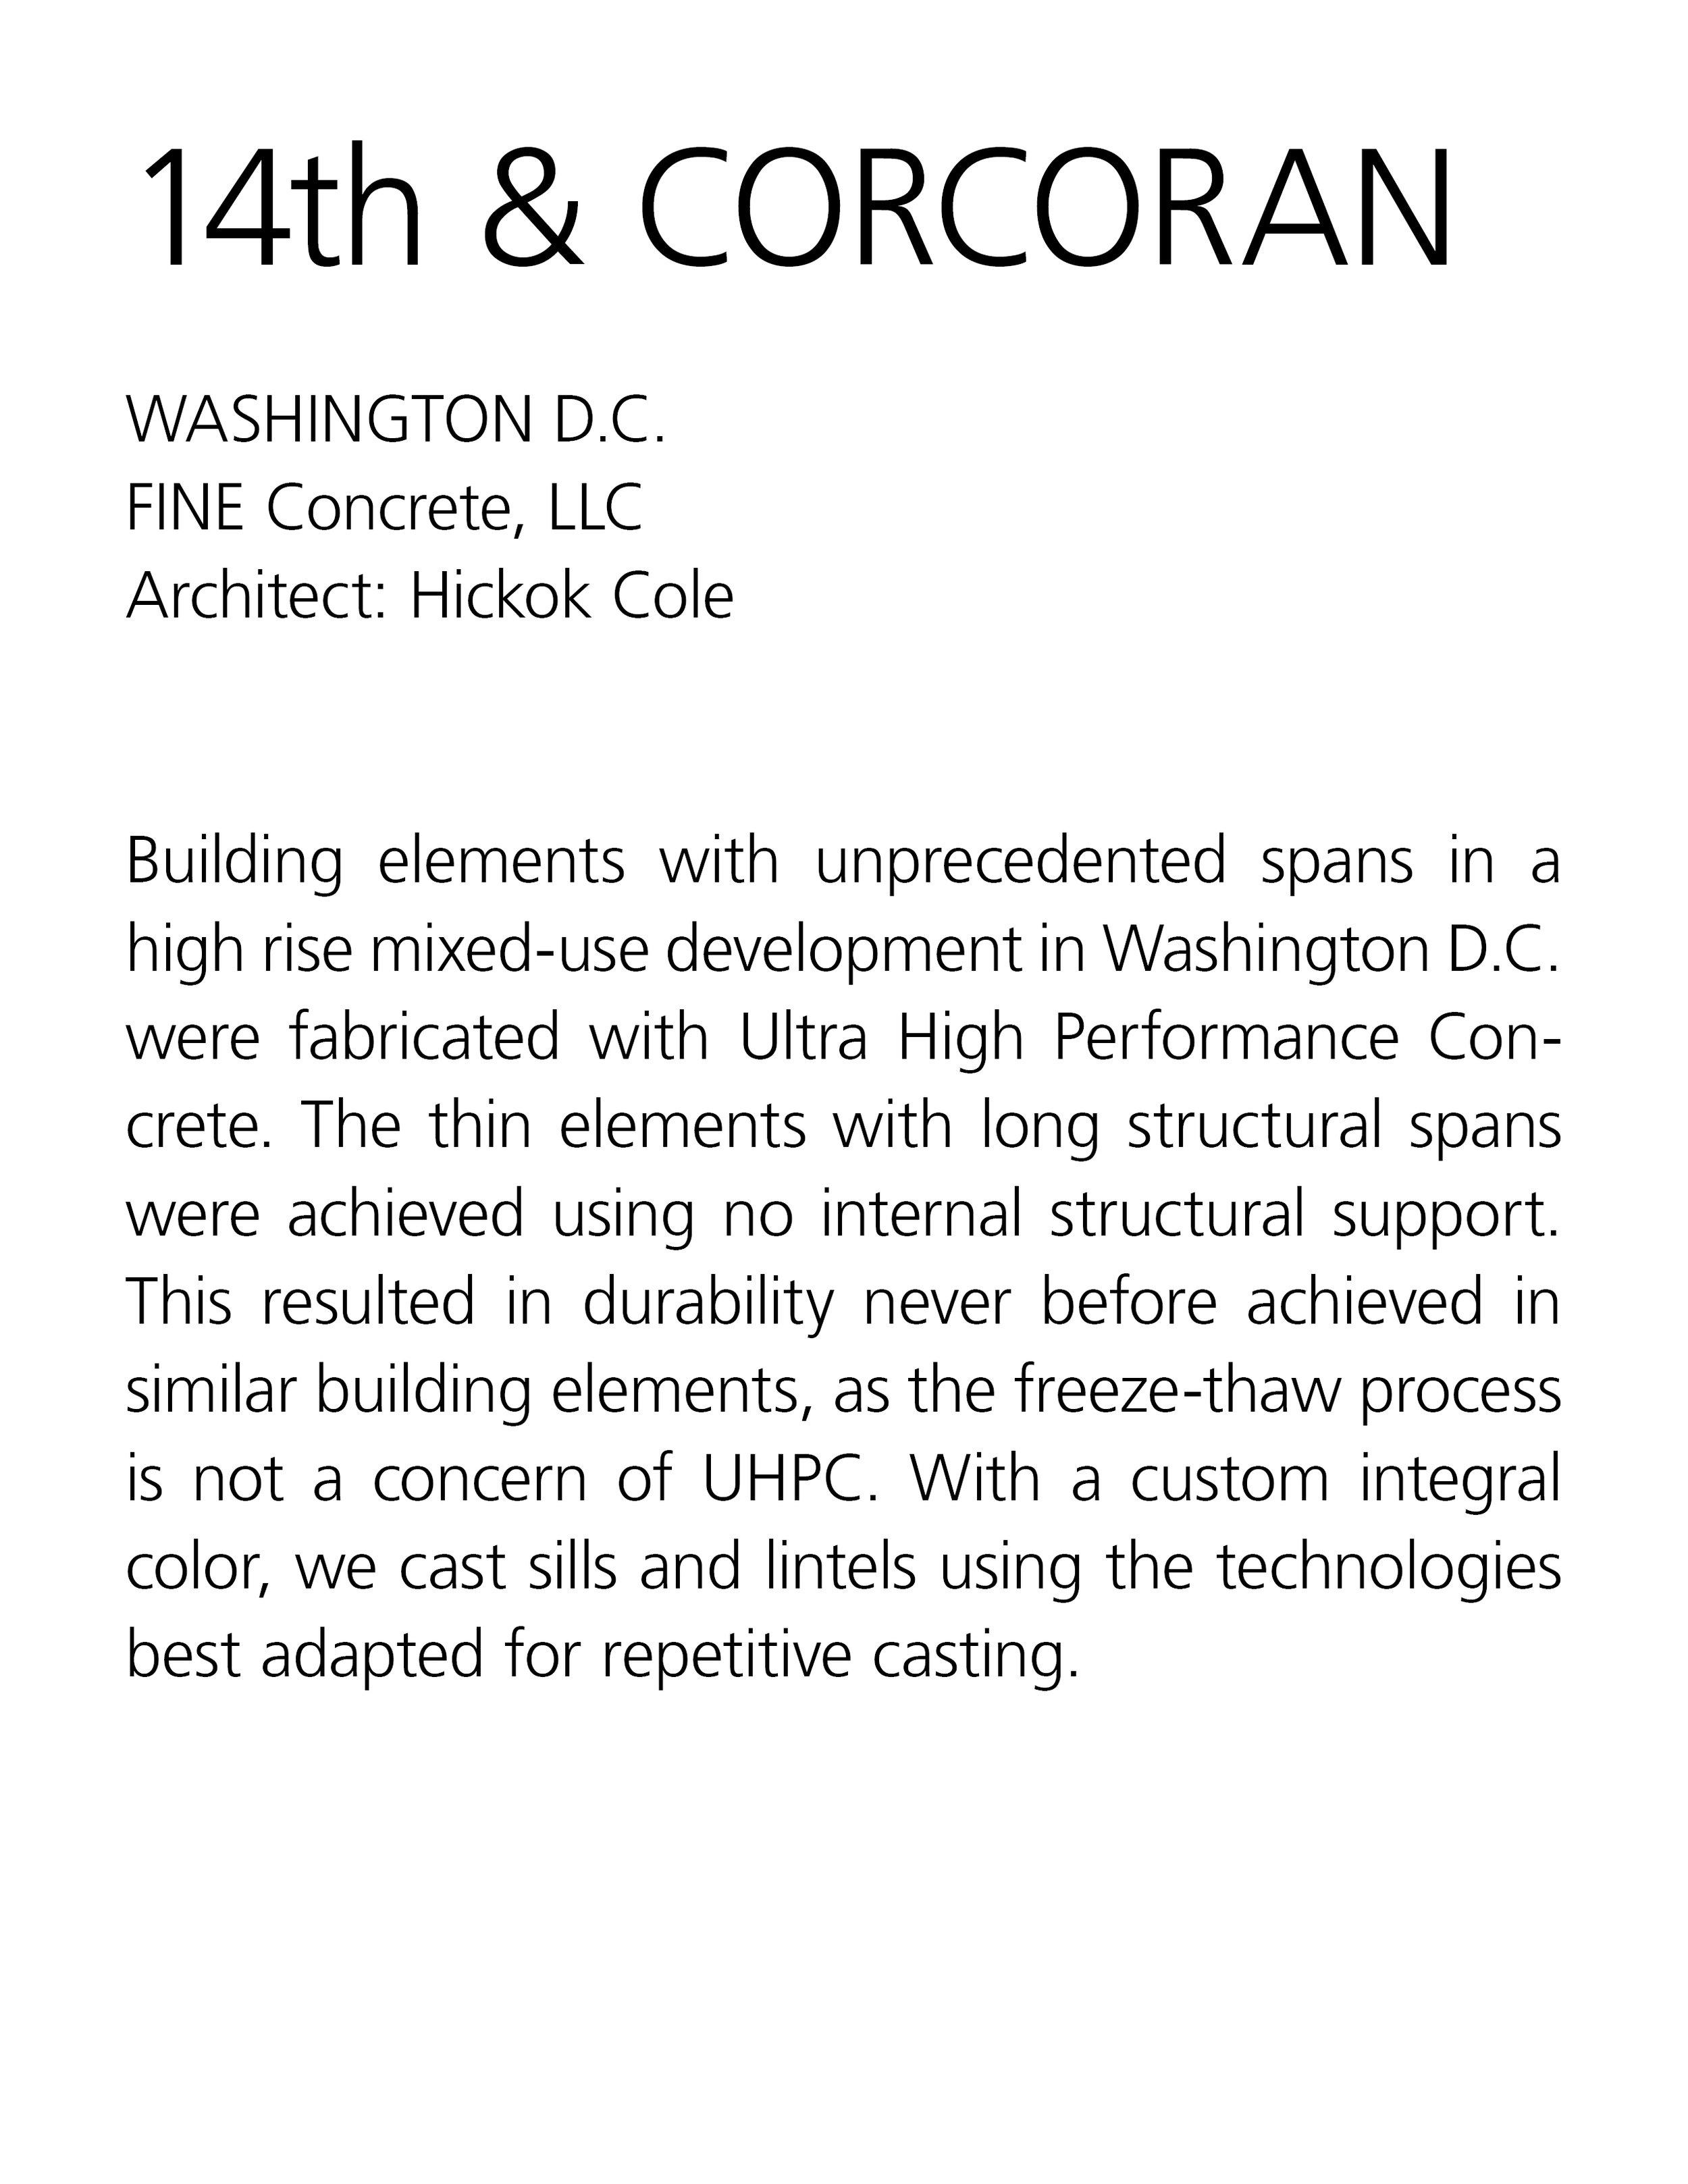 14th Corcoran description.jpg